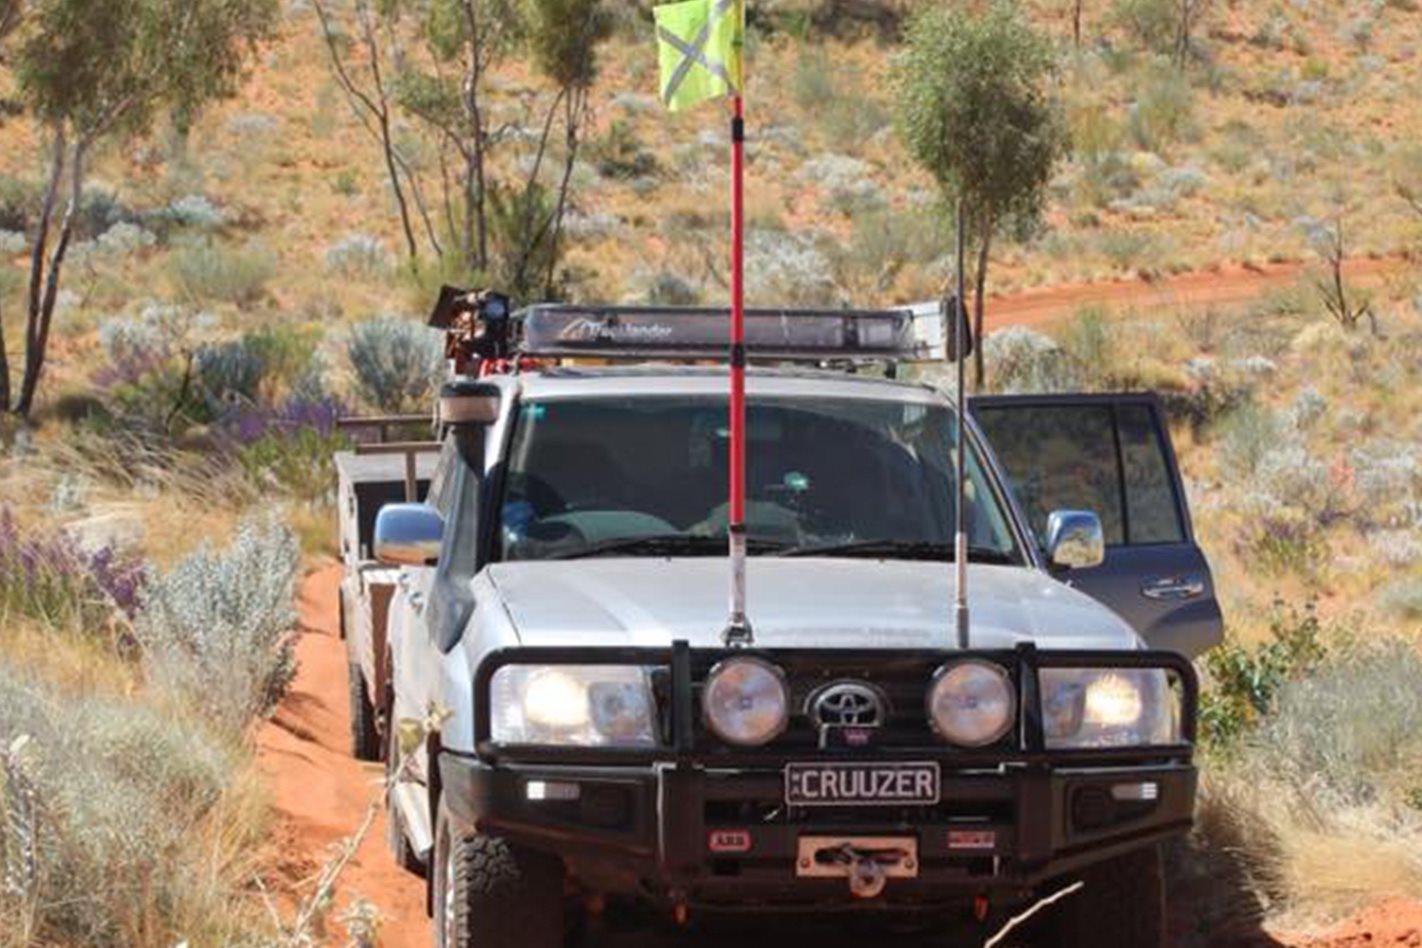 2006 TOYOTA LAND CRUISER GXL 1HD-FTE – STEVE & BEC GUNSON